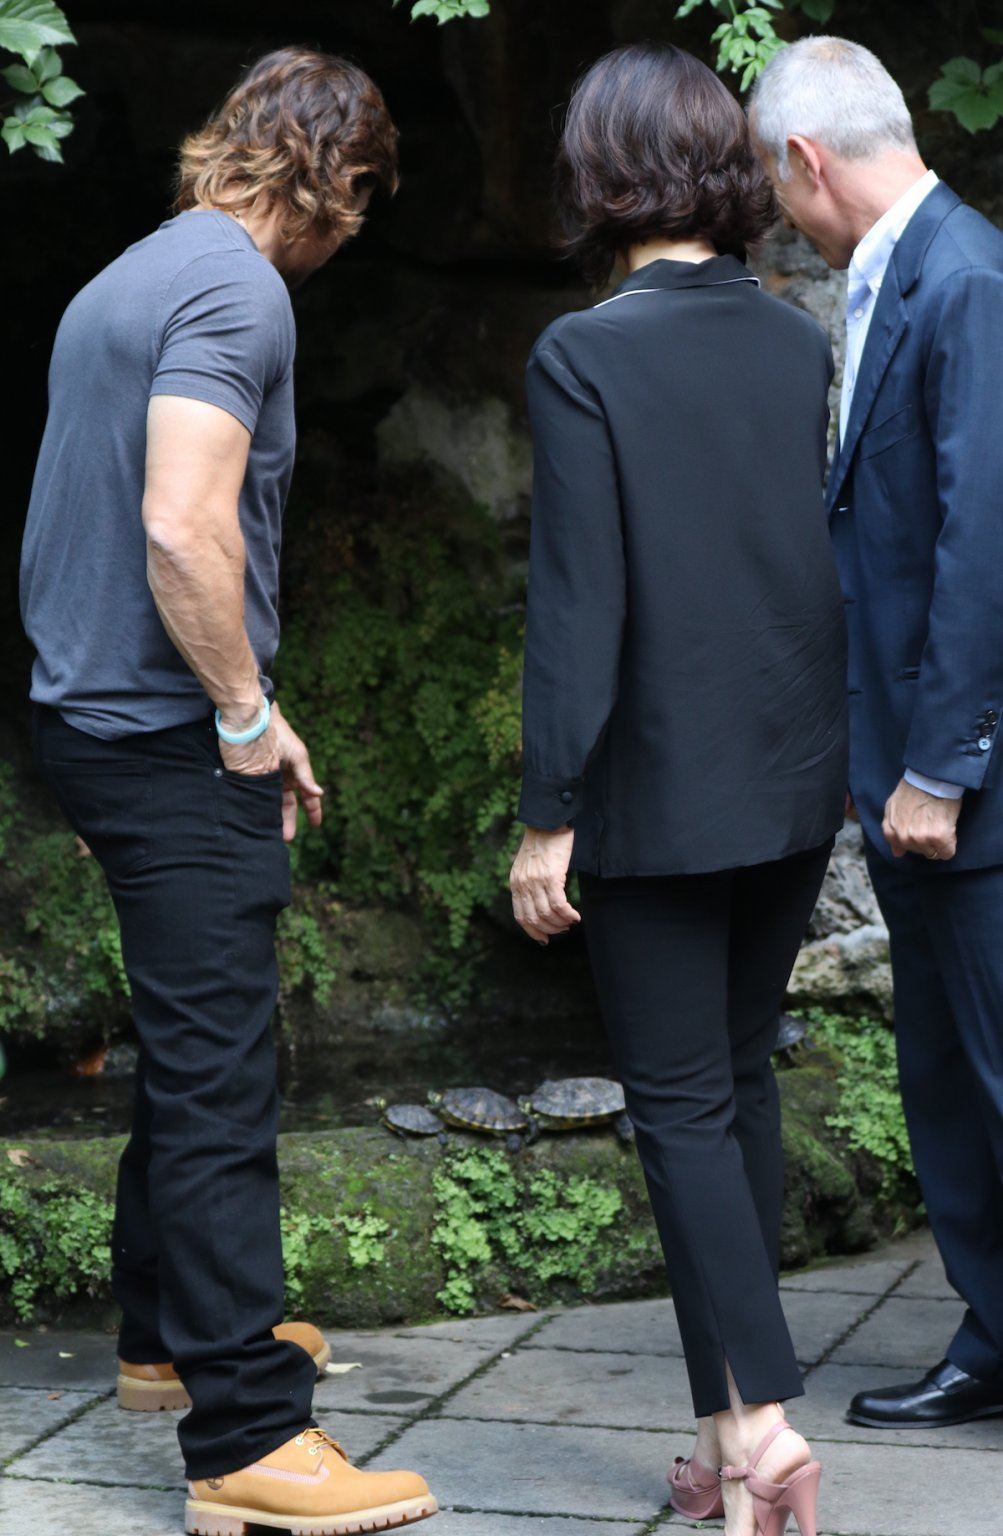 Deepwater: Mark Wahlberg e i produttori guardano incuriositi le tartarughe al photocall